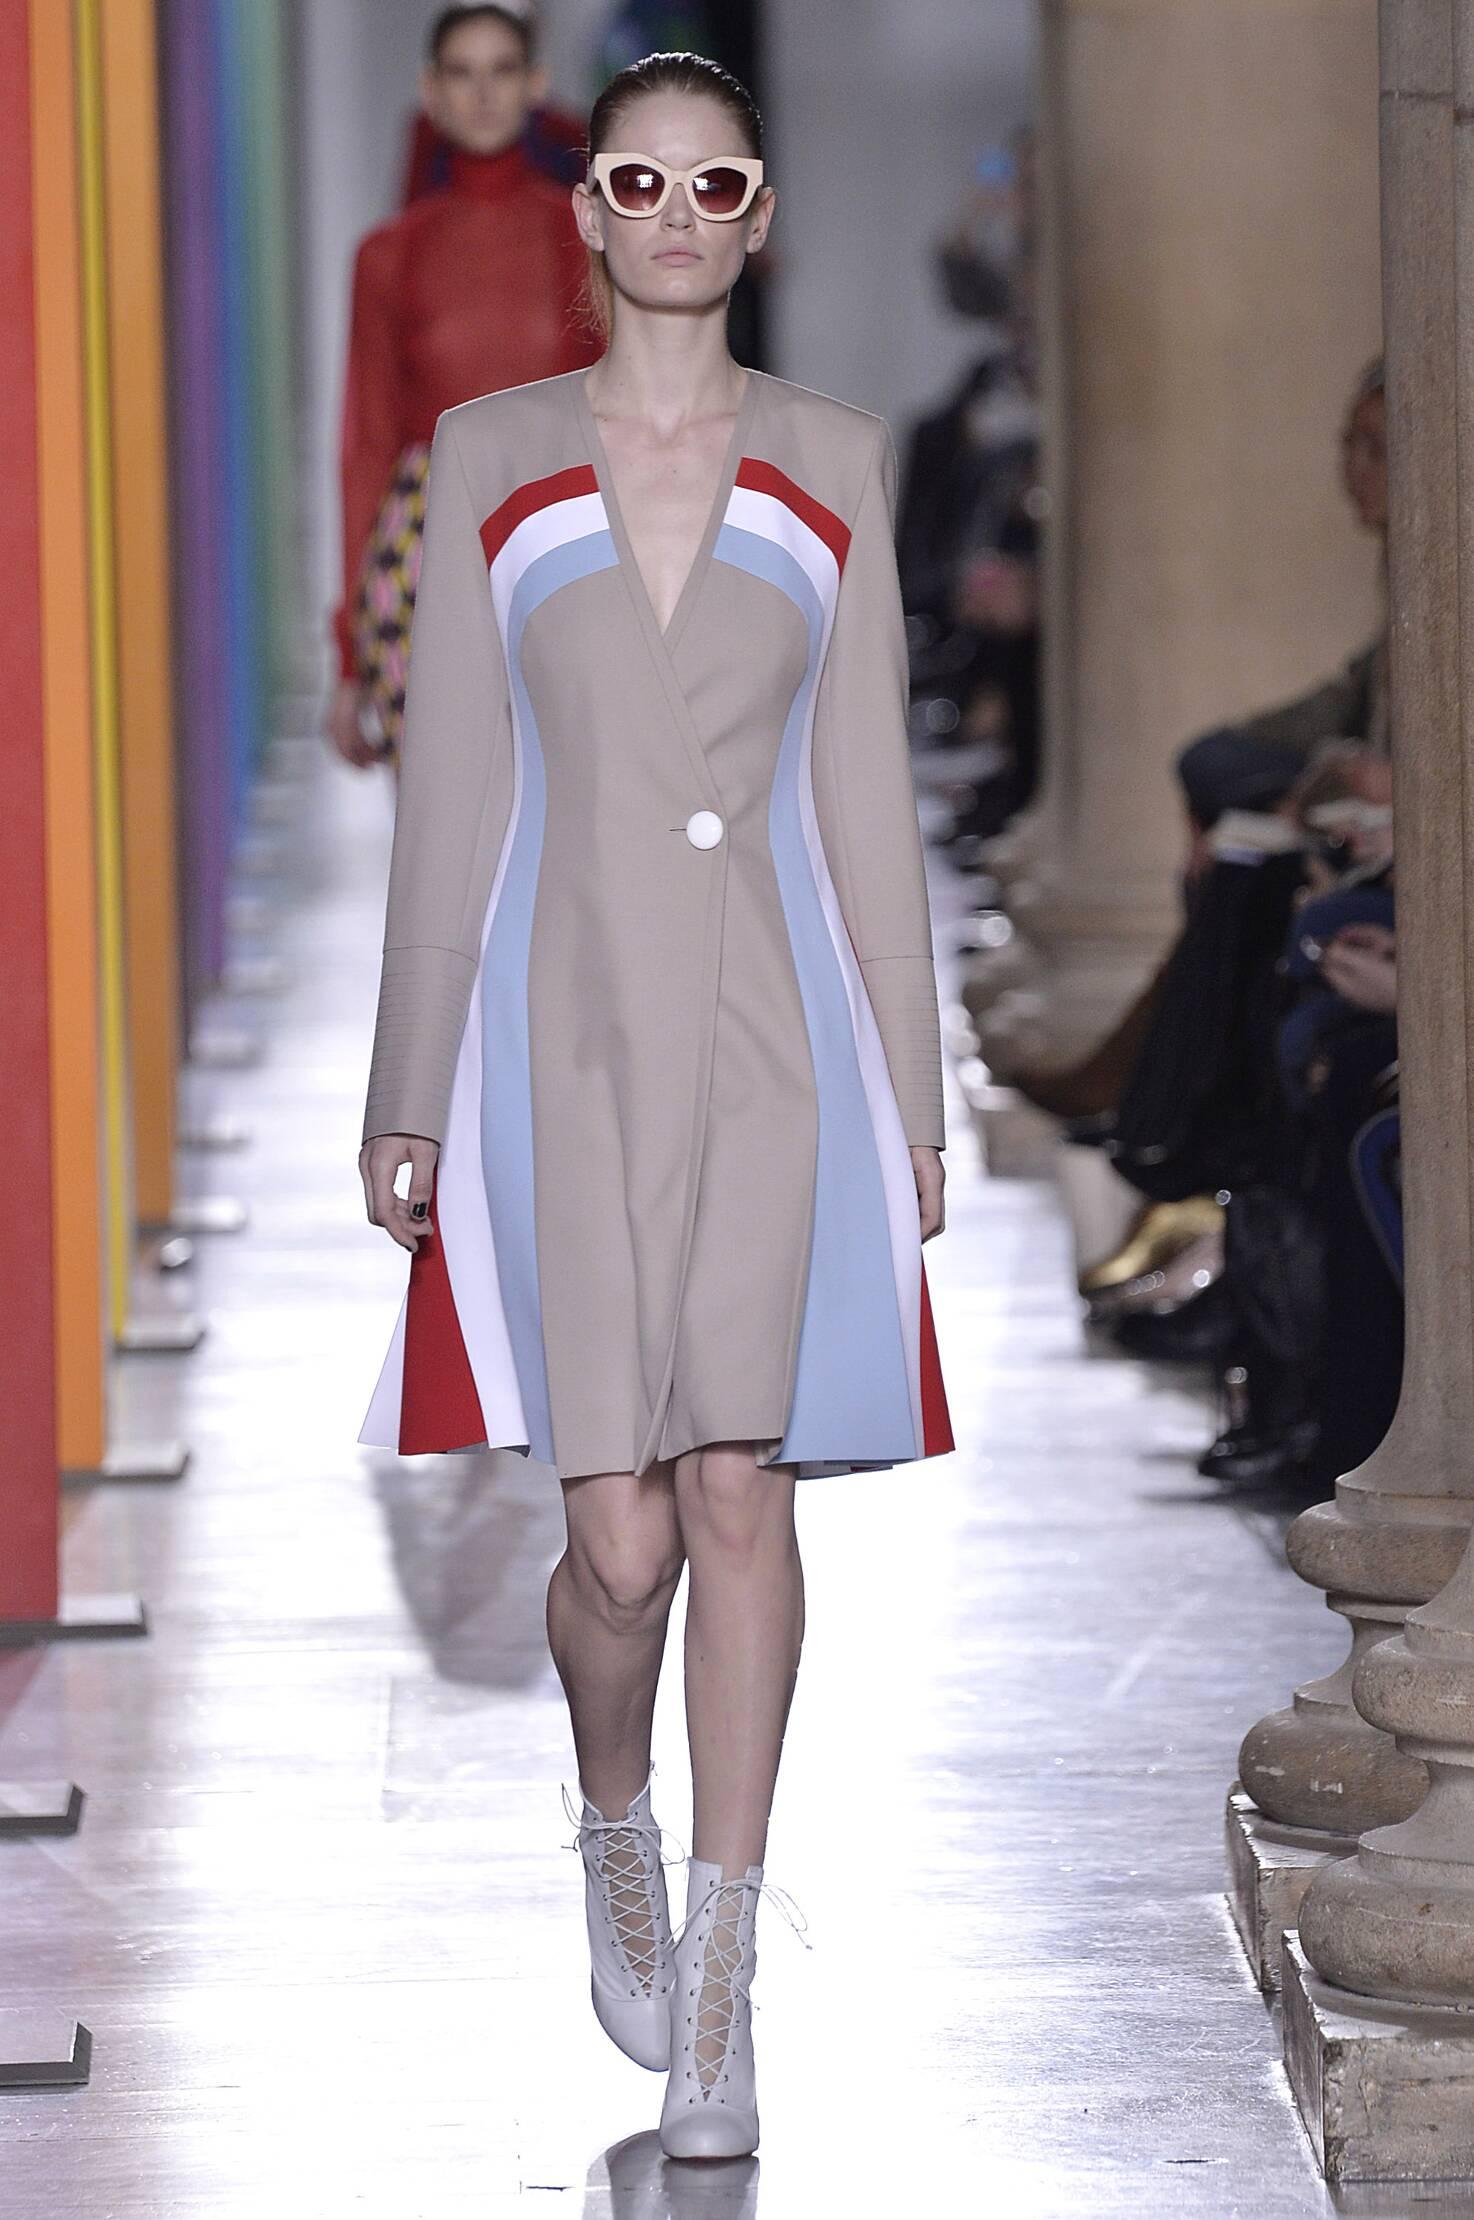 Fall Jonathan Saunders Collection Fashion Women Model